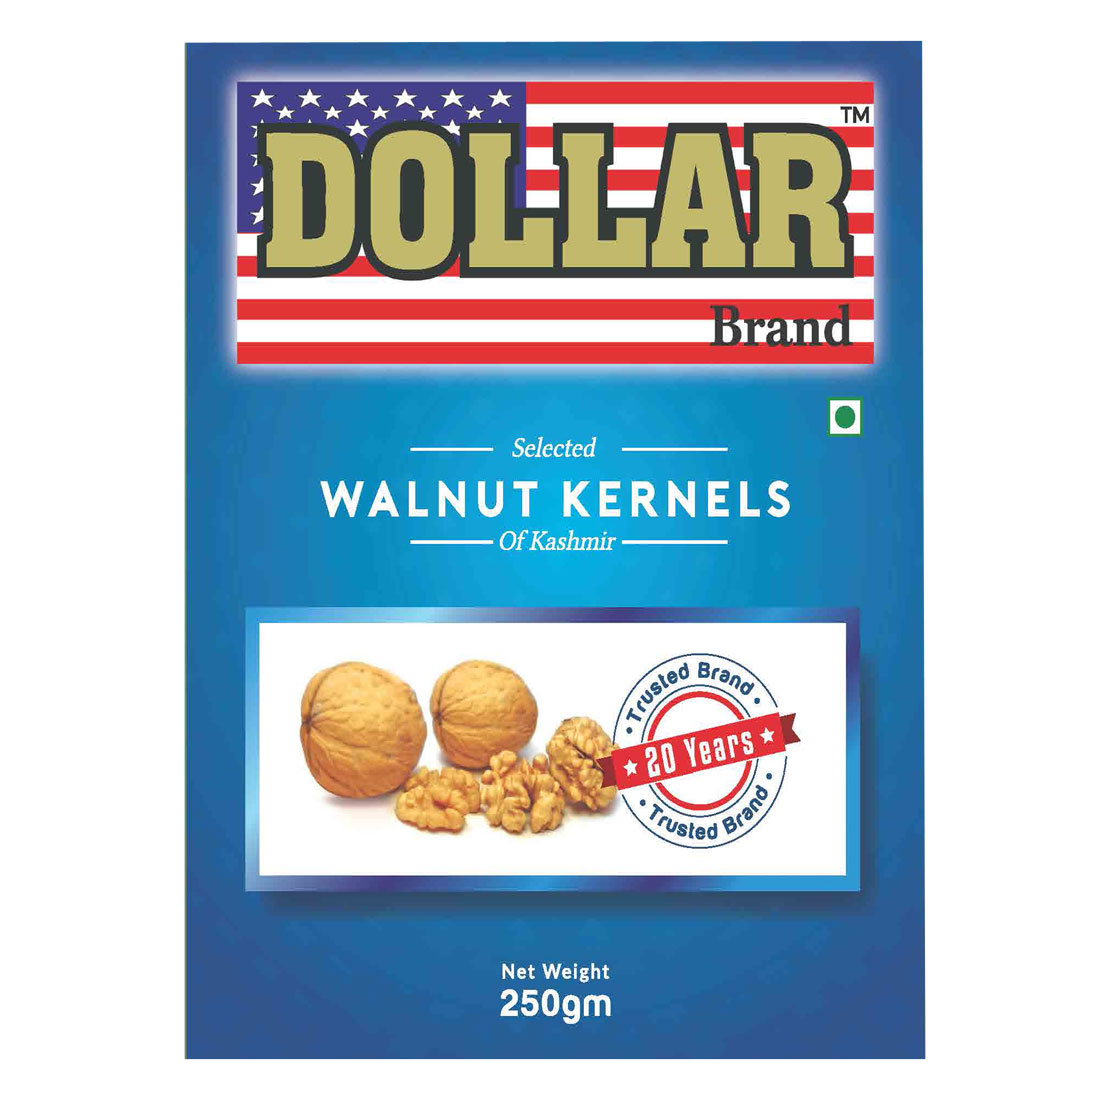 Dollar Brand Selected Walnut Kernels of kashmir -250g